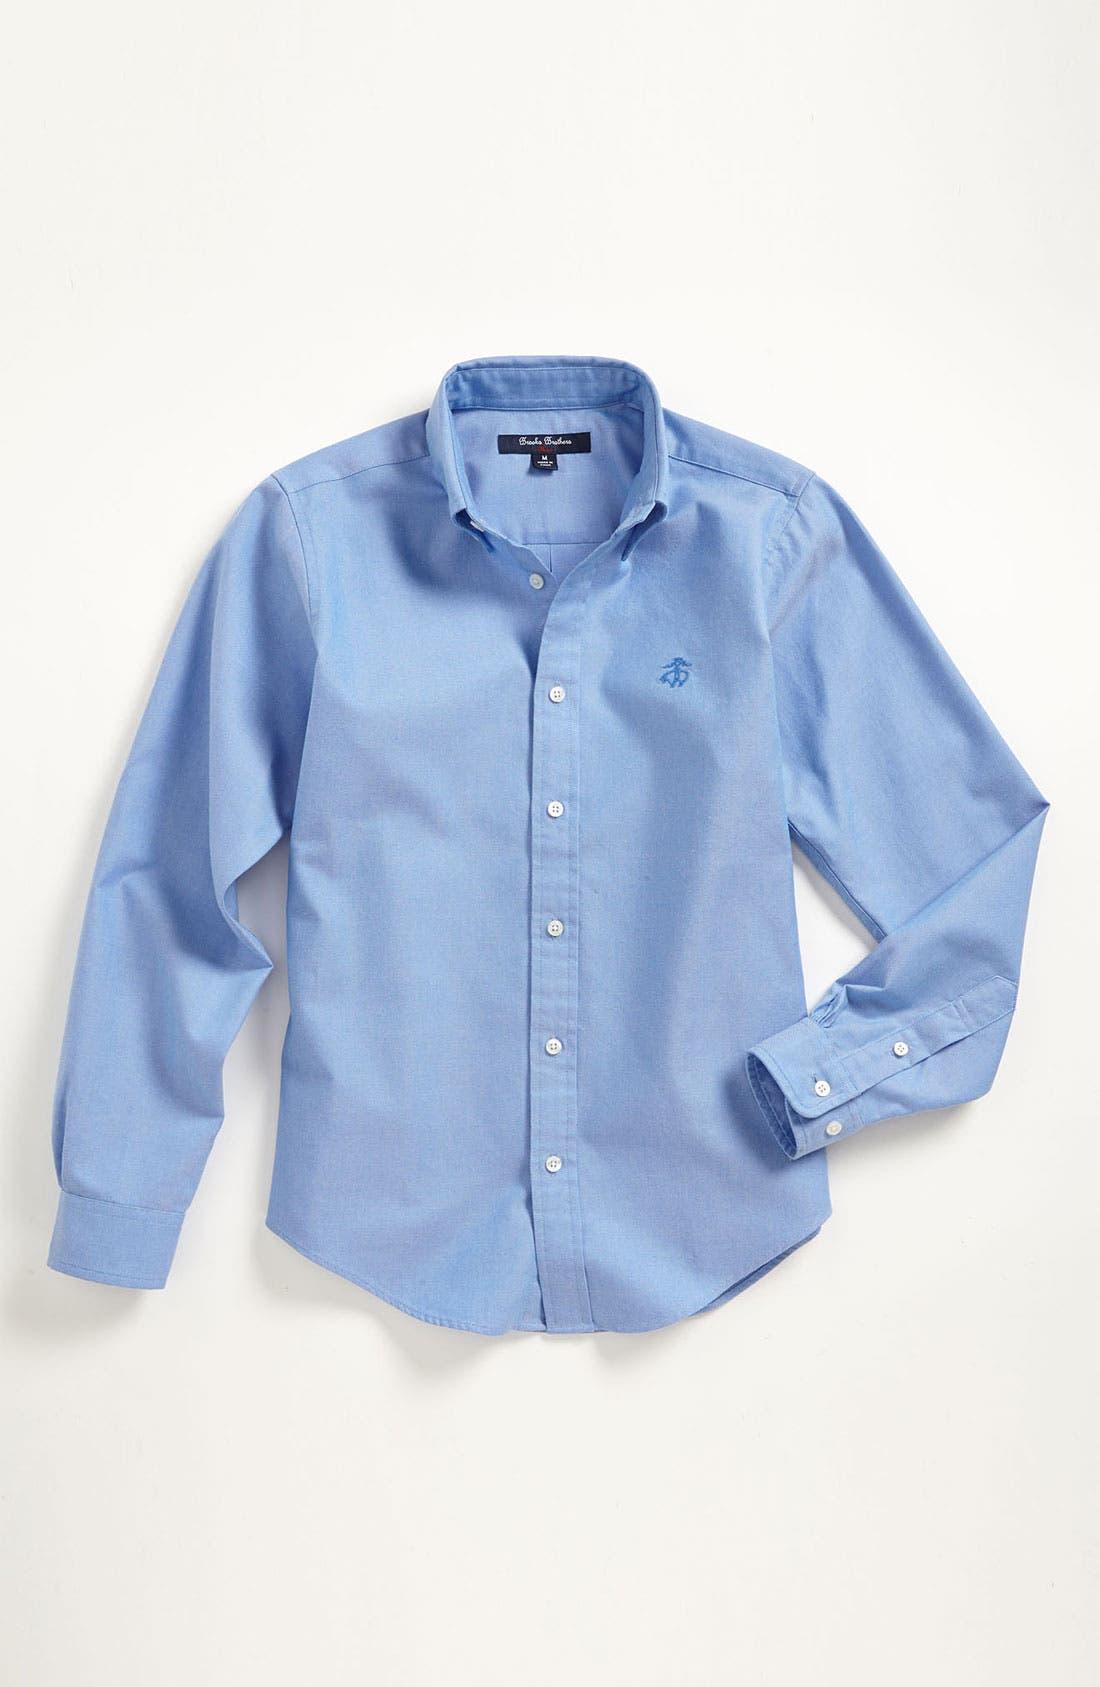 Alternate Image 1 Selected - Brooks Brothers Oxford Sport Shirt (Big Boys)